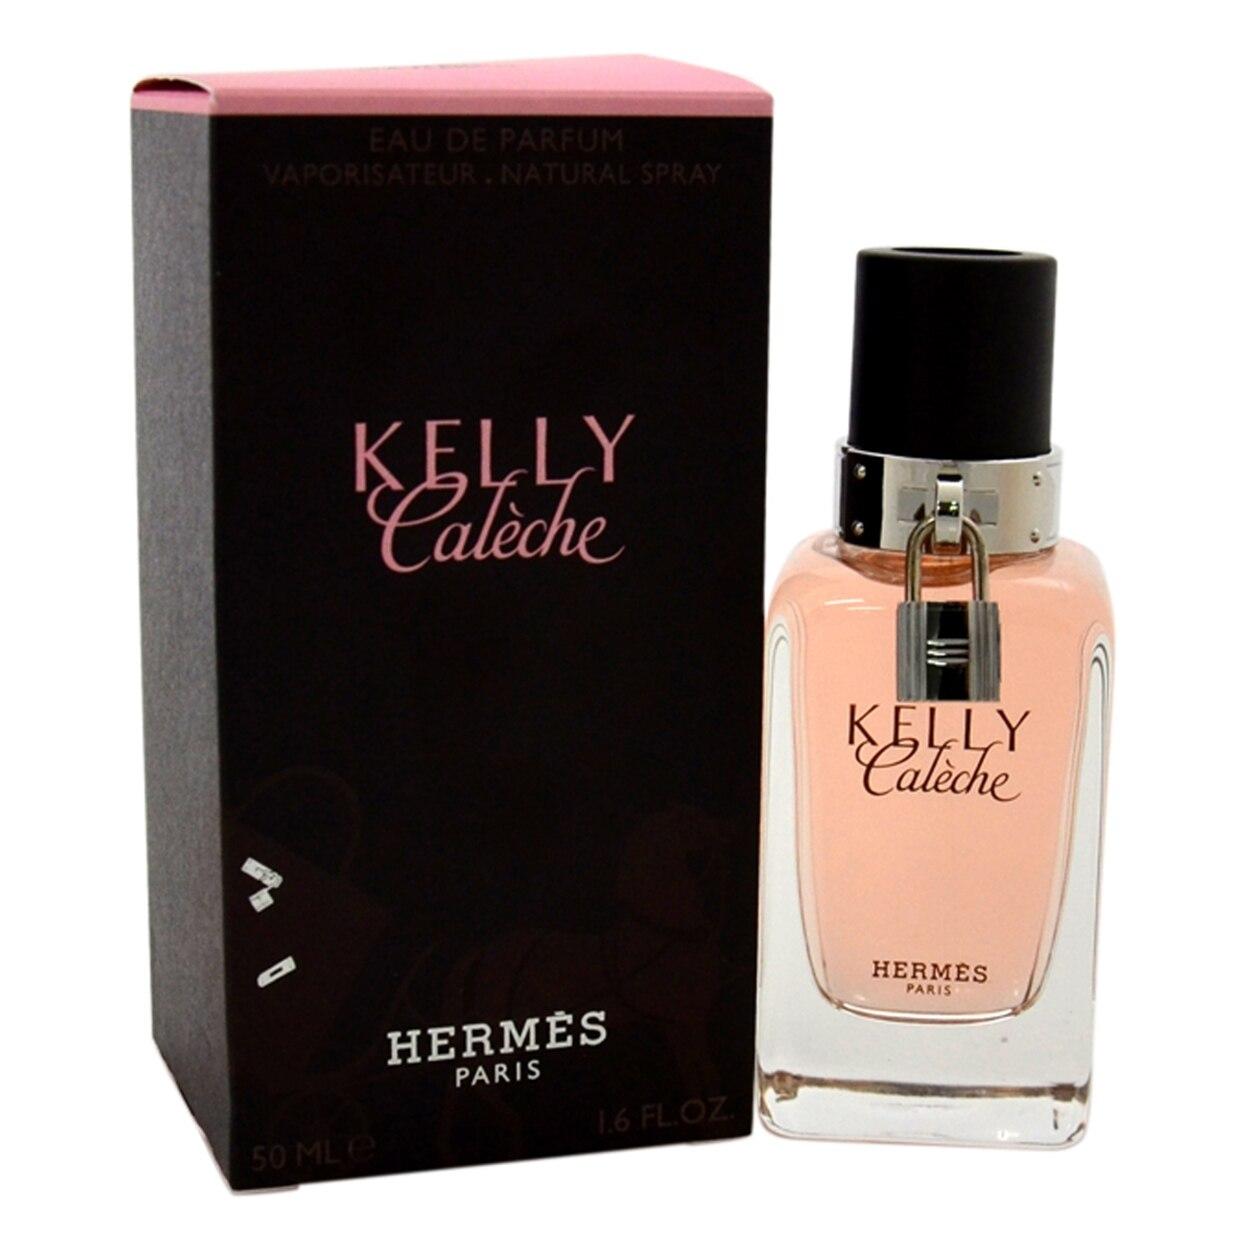 Kelly Caleche by Hermes for Women - 1.6 oz EDP Spray hermes женская туалетная вода hermes kelly caleche 22218h 50 мл